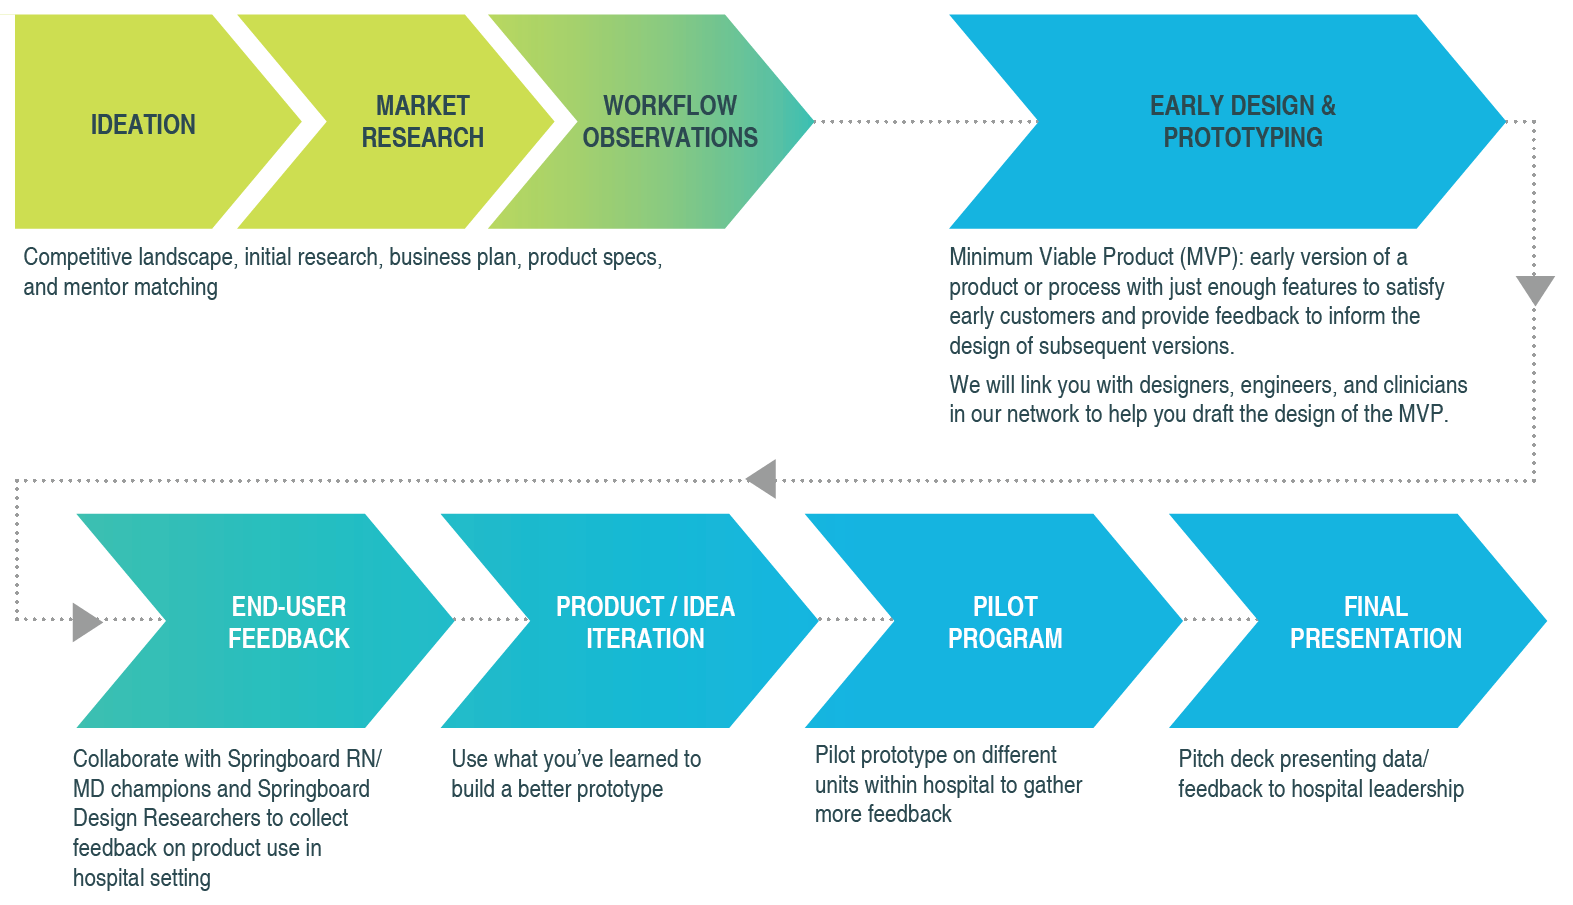 Moving Ideas Forward: Key Milestones